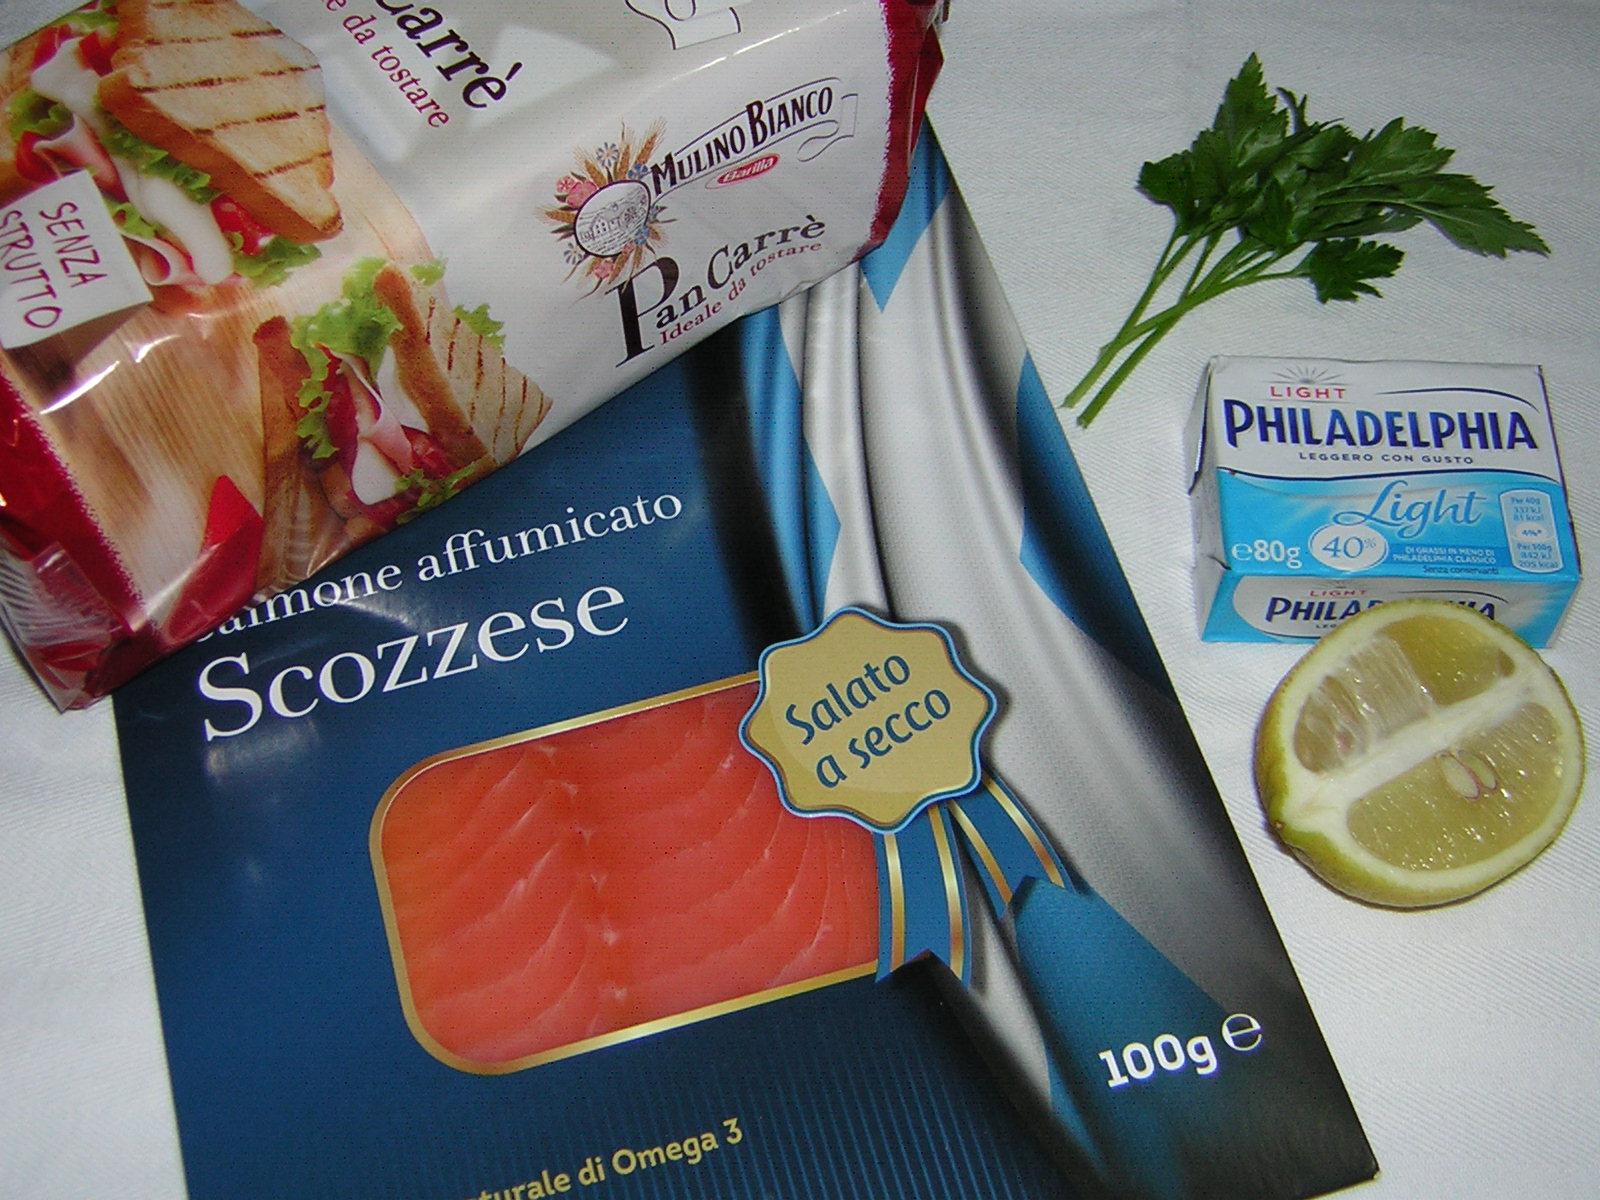 ingredienti per le tartine al salmone affumicato leggere